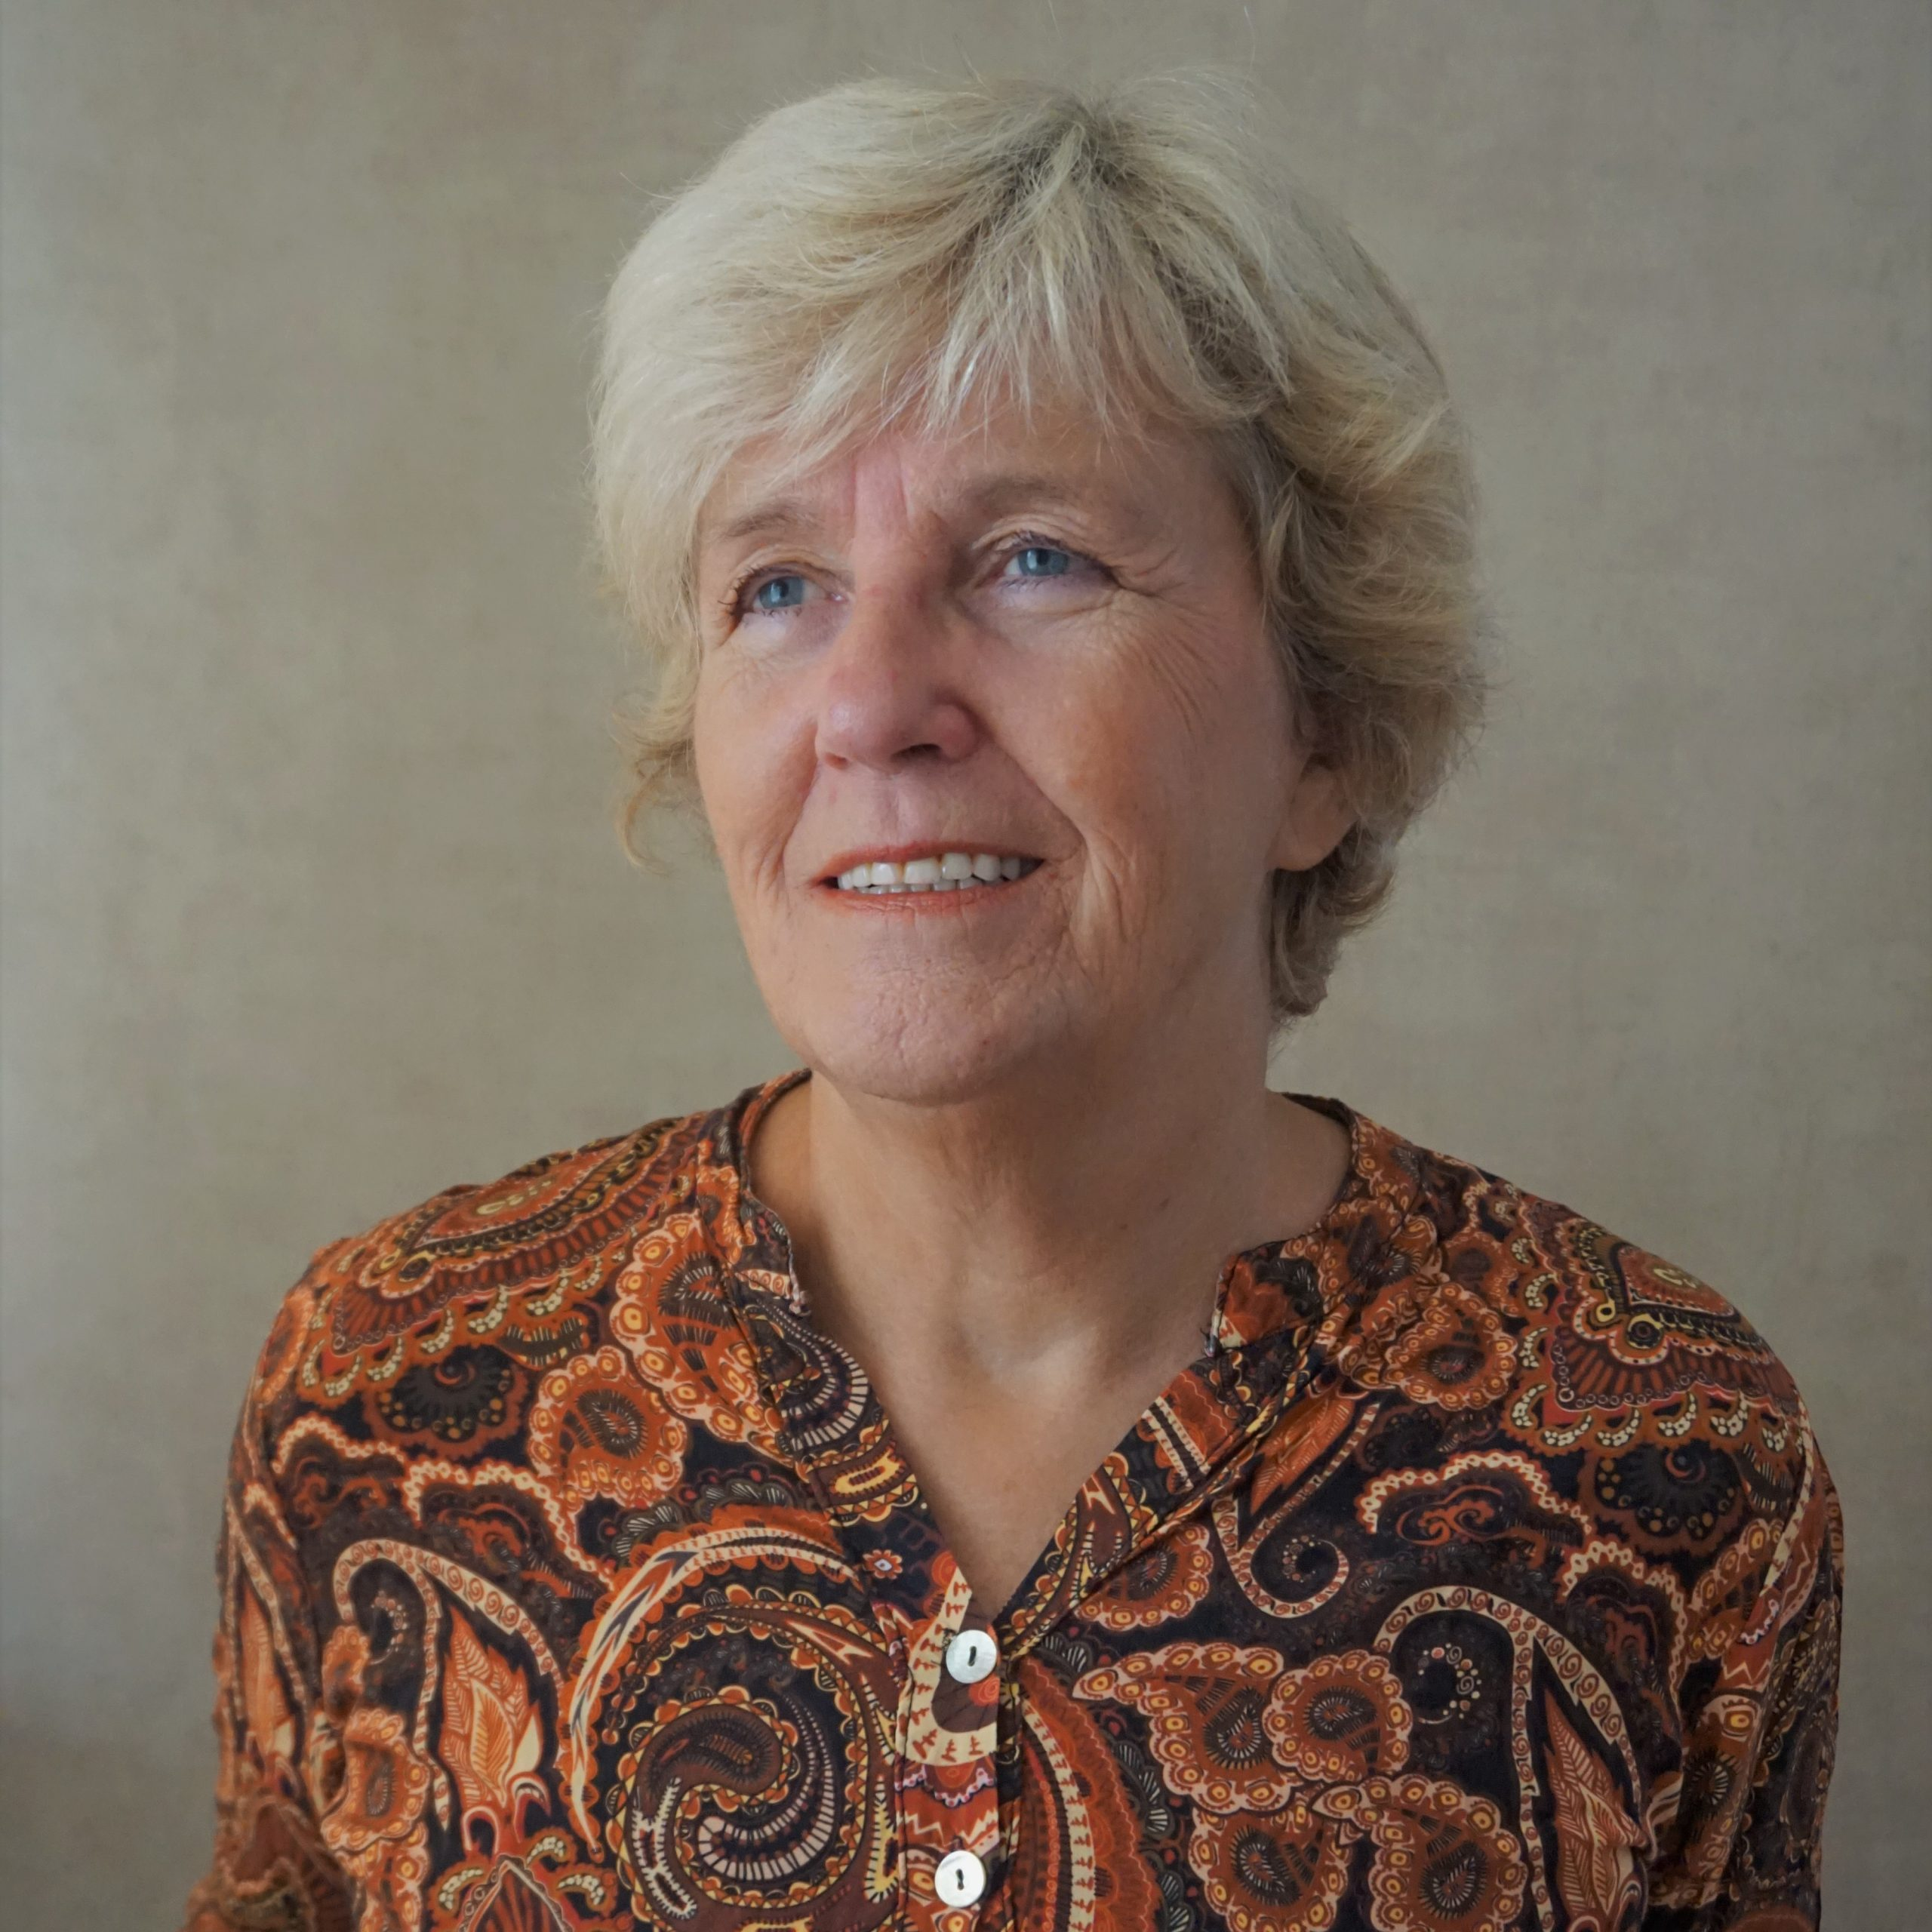 Annemiek Jentjens